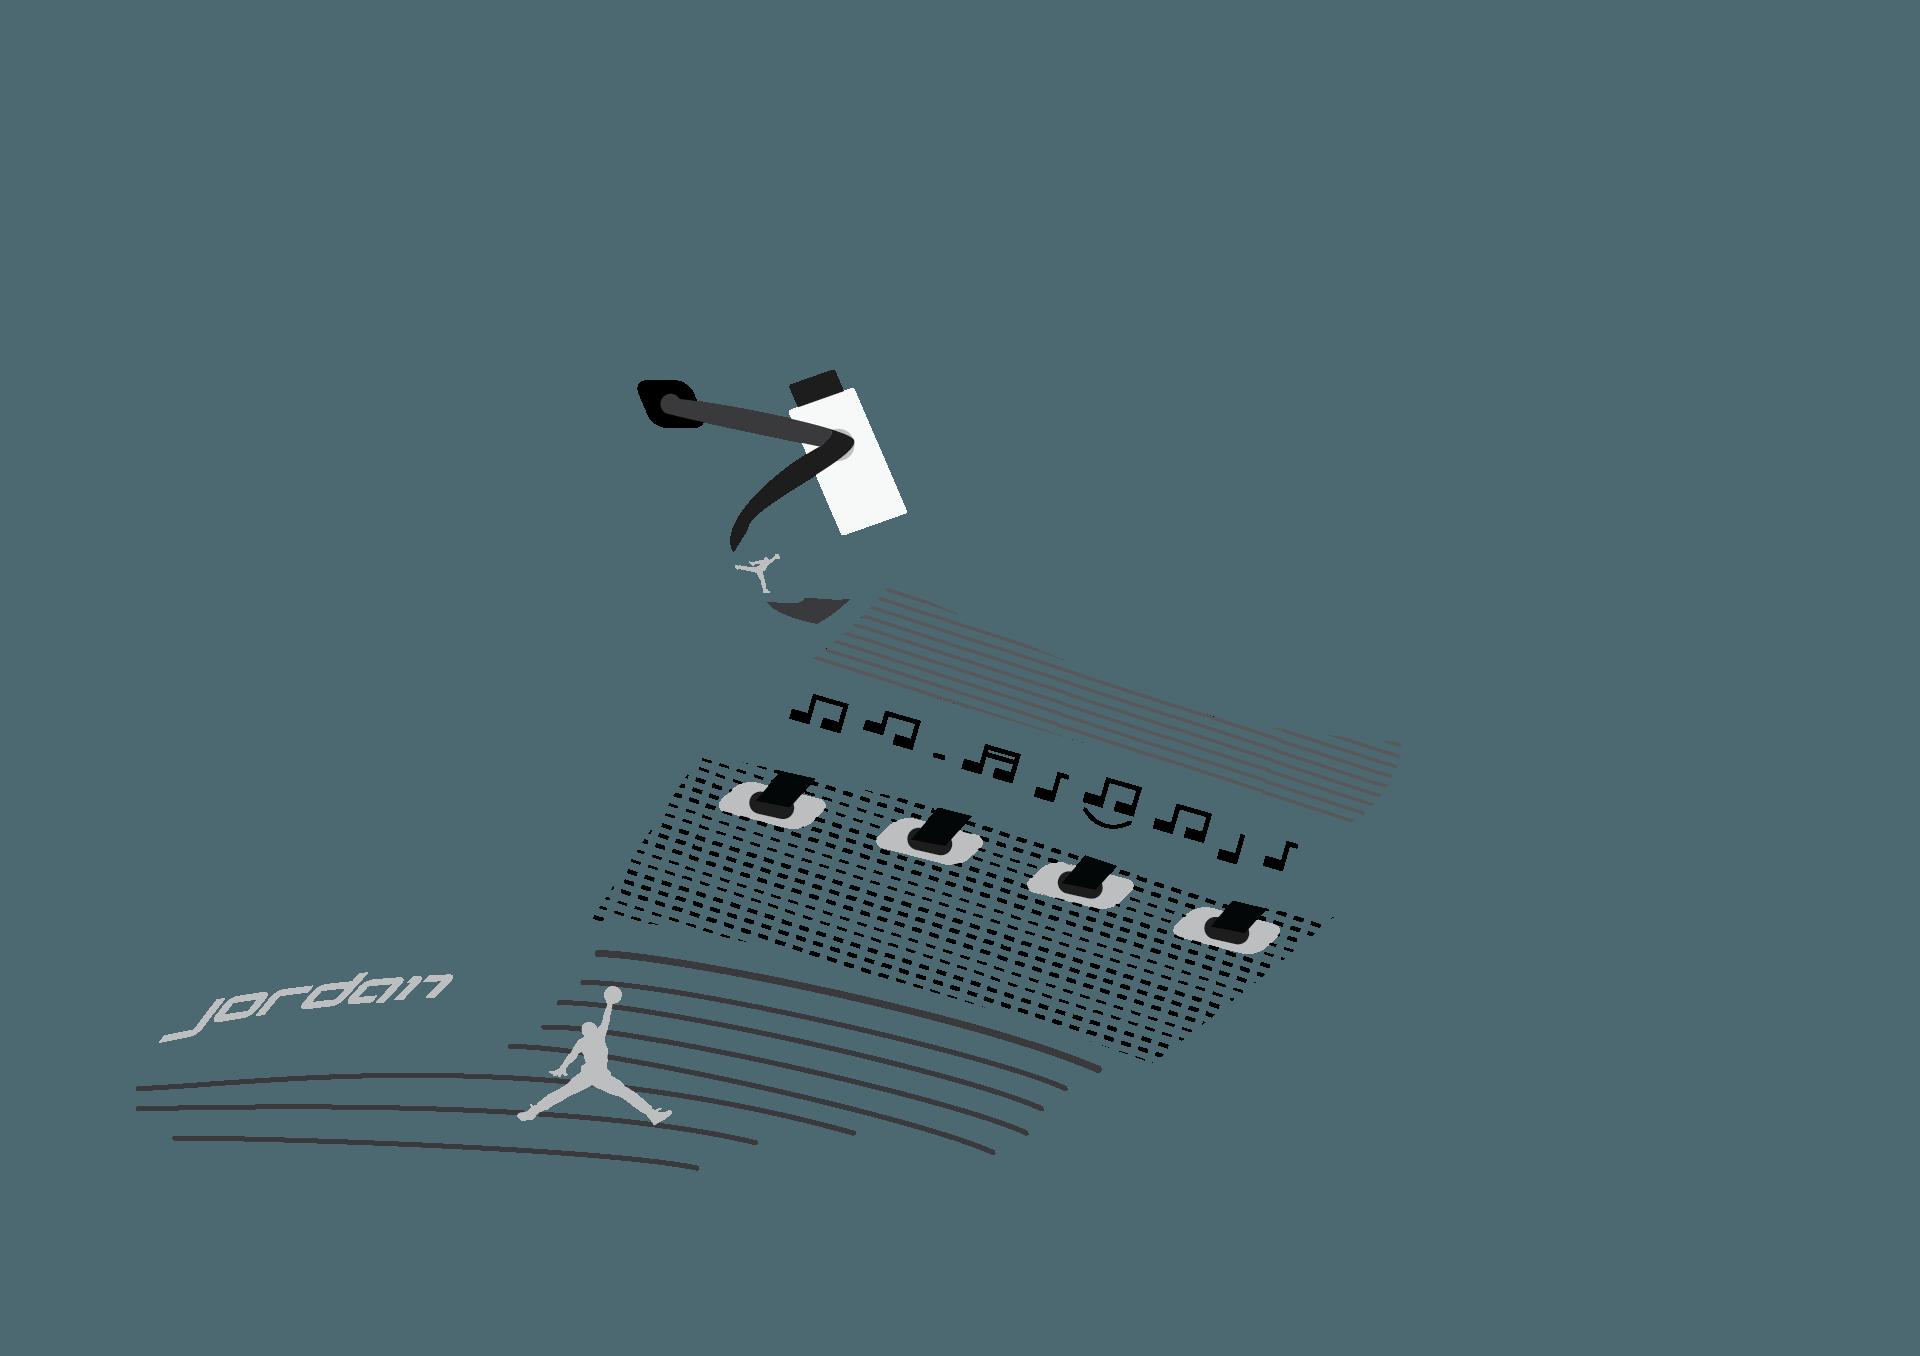 52f67553a93c97 A visual history of every Air Jordan